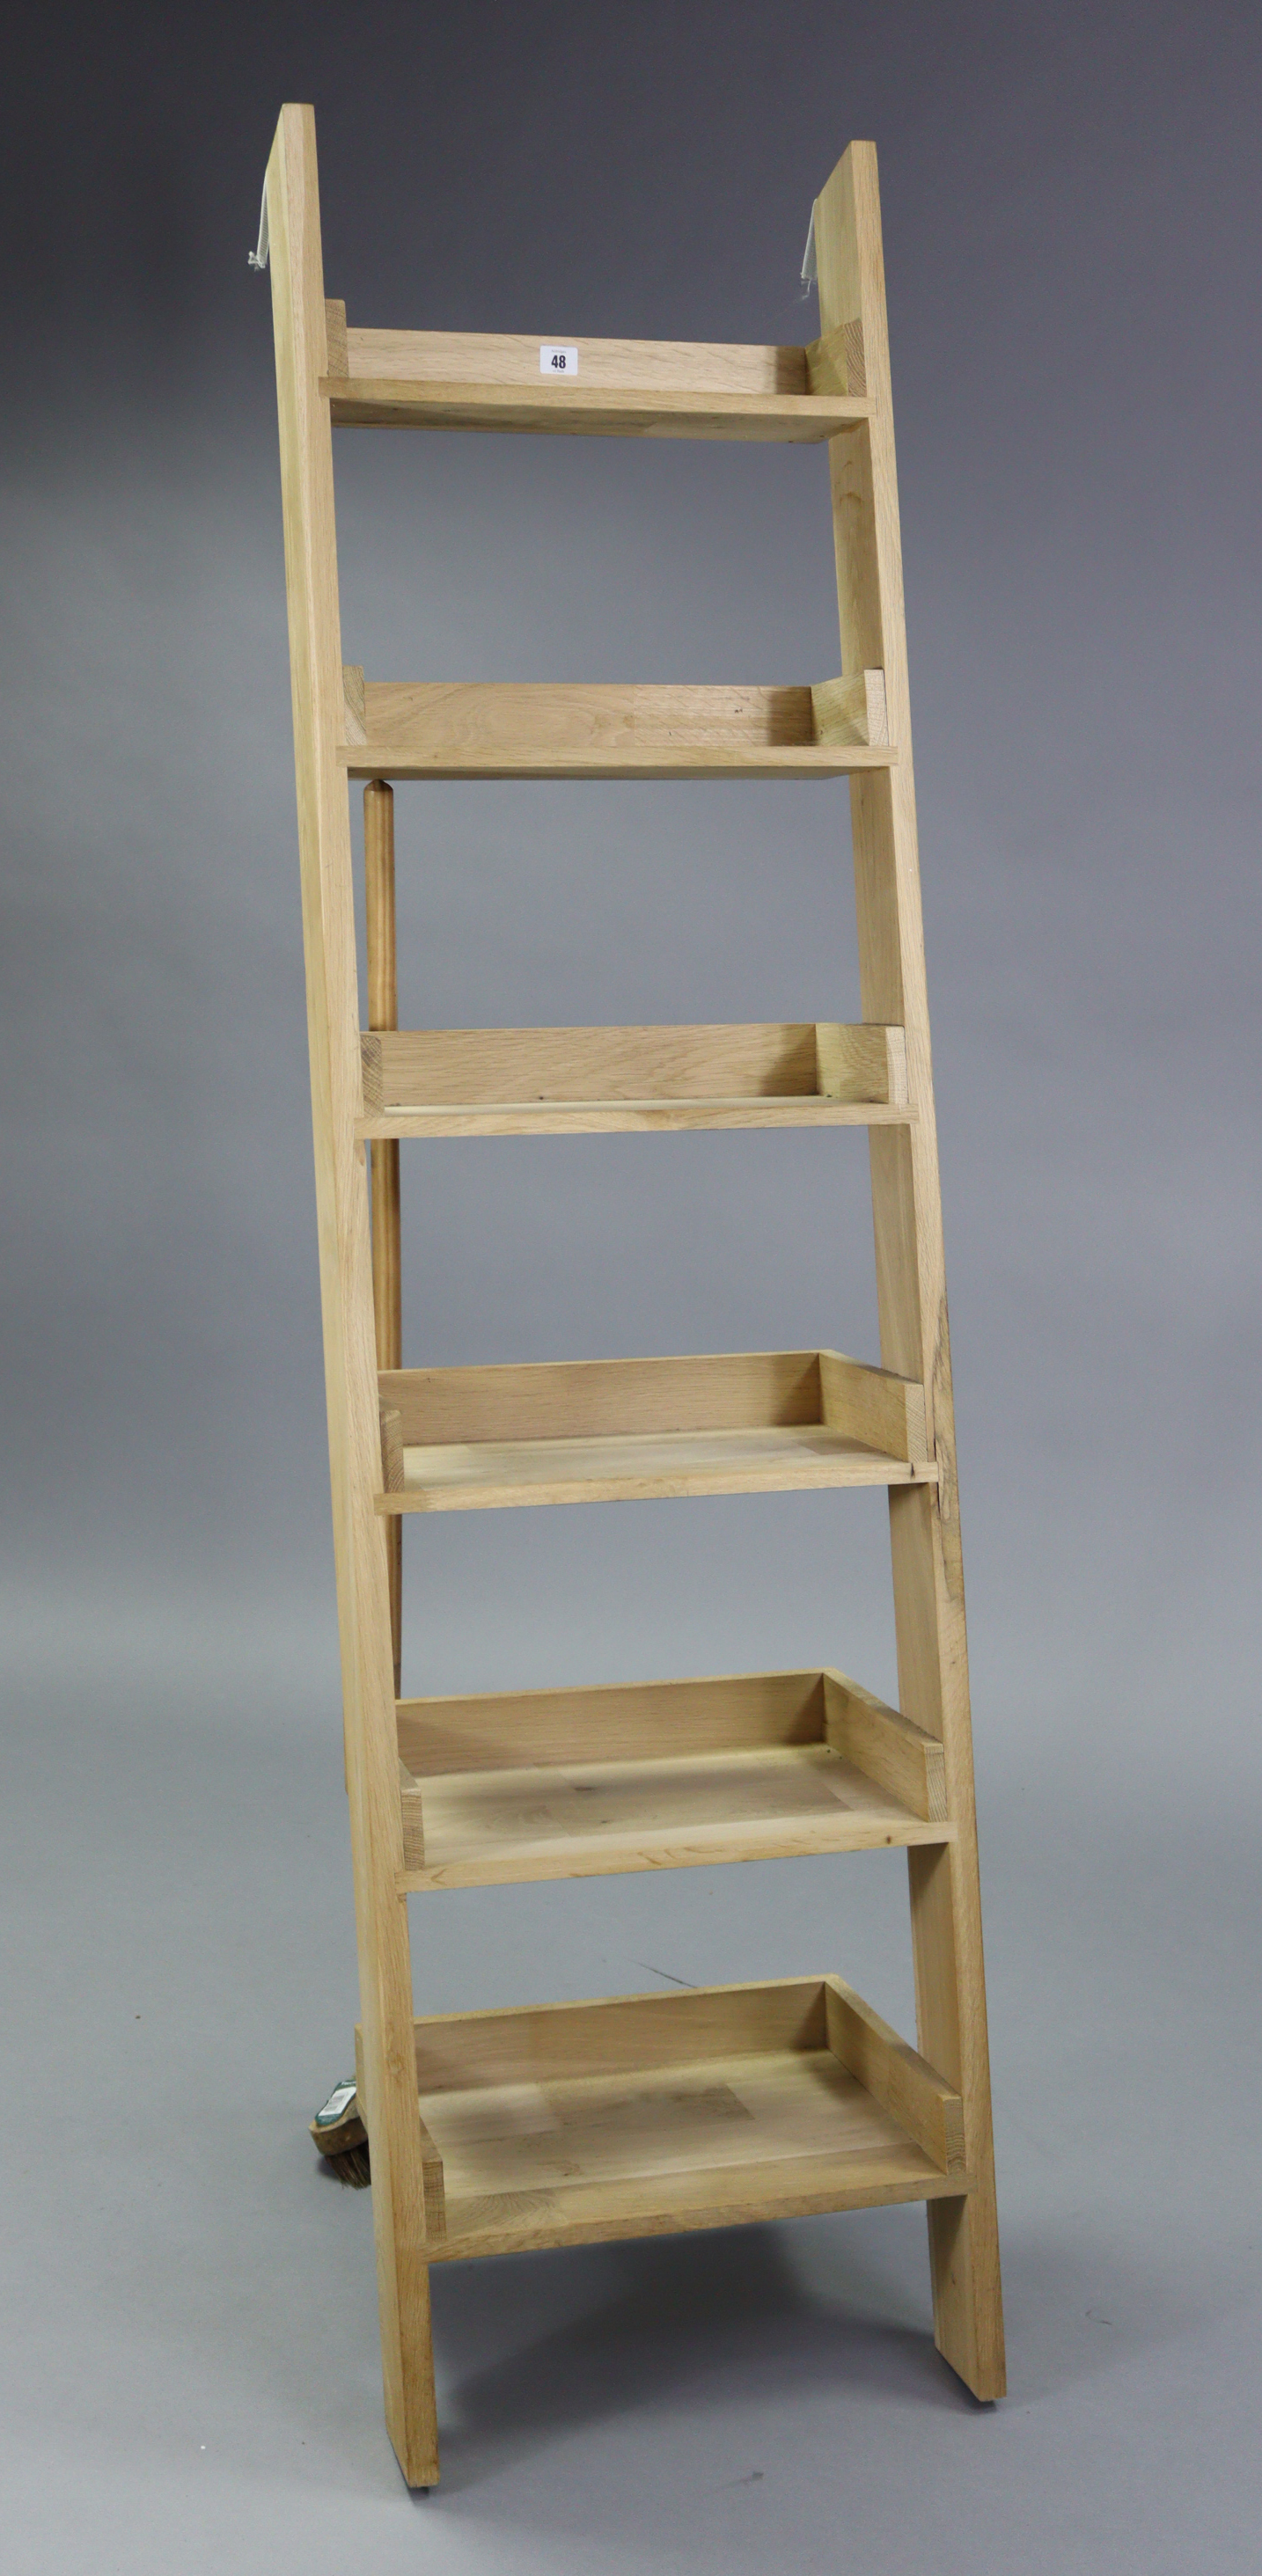 "A light oak tall six-tier lean-to shelf unit, 18¾"" wide x 71"" high."